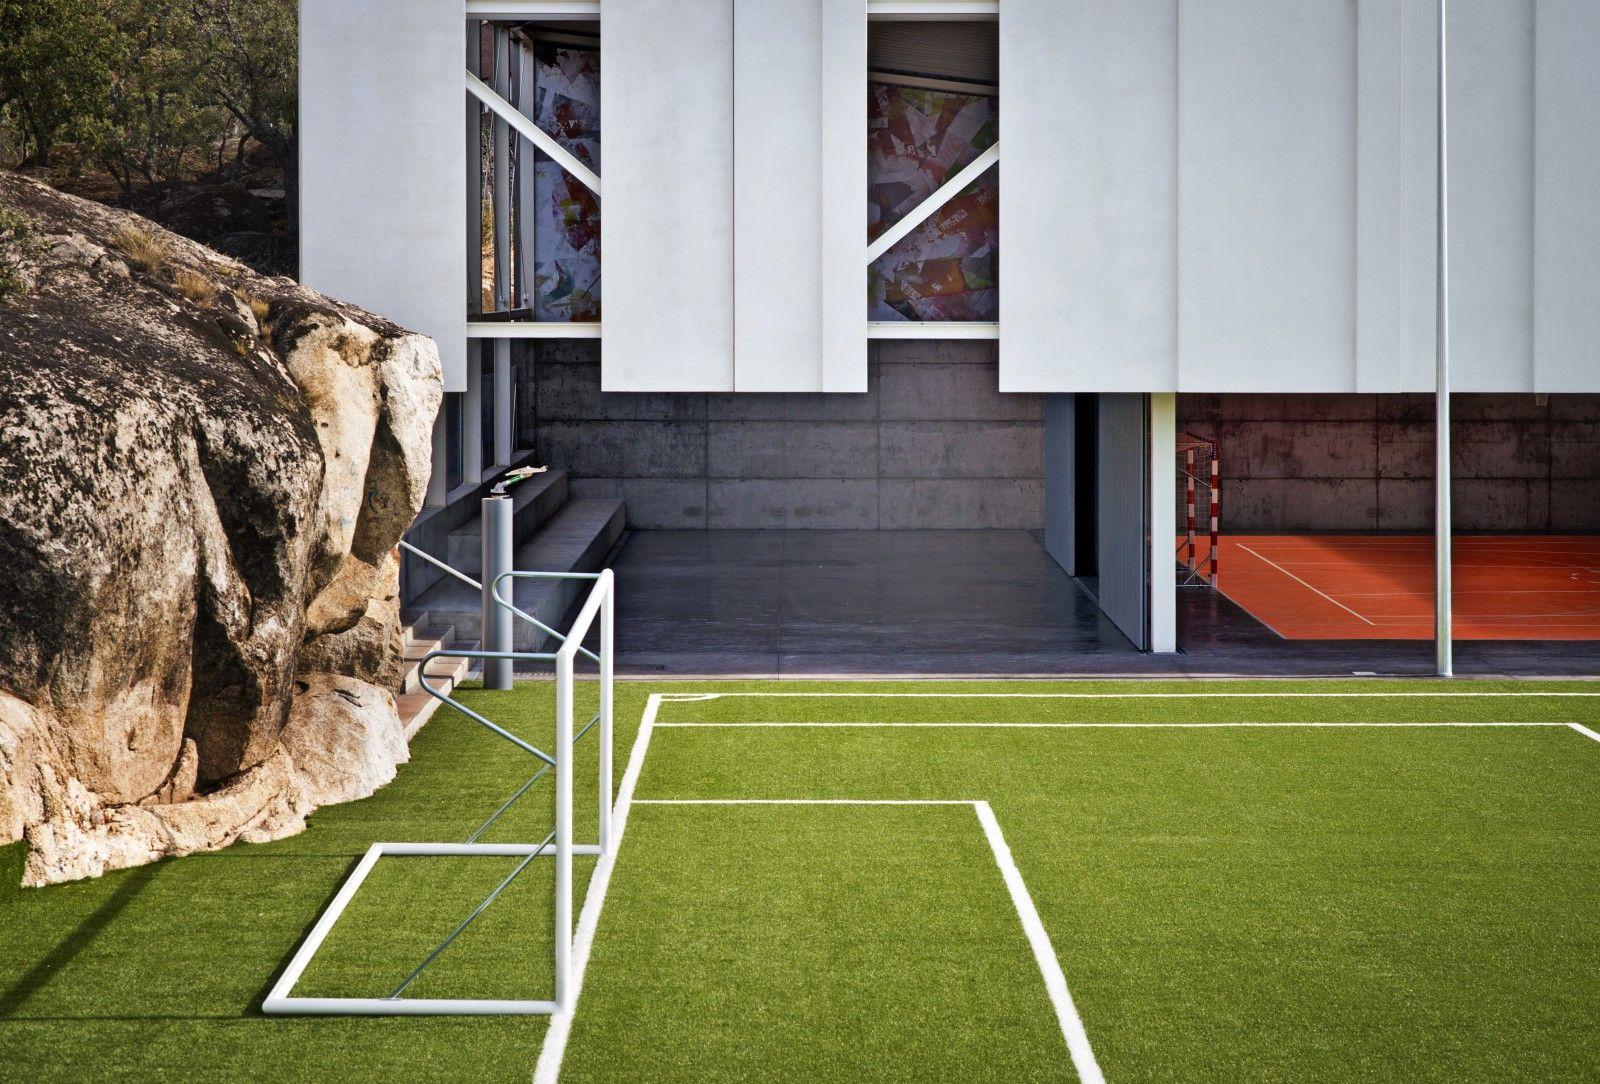 Pabell n de deportes u3 estudio de arquitectura madrid polis pabell n estudio de - Pabellon de deportes madrid ...